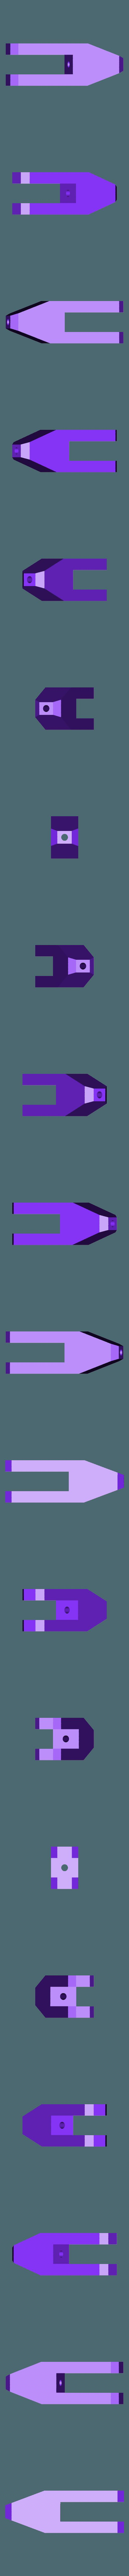 QWIK_SERVO_46mm_delta.stl Download free OBJ file Horn and qwick links • 3D printable object, PaulDrones